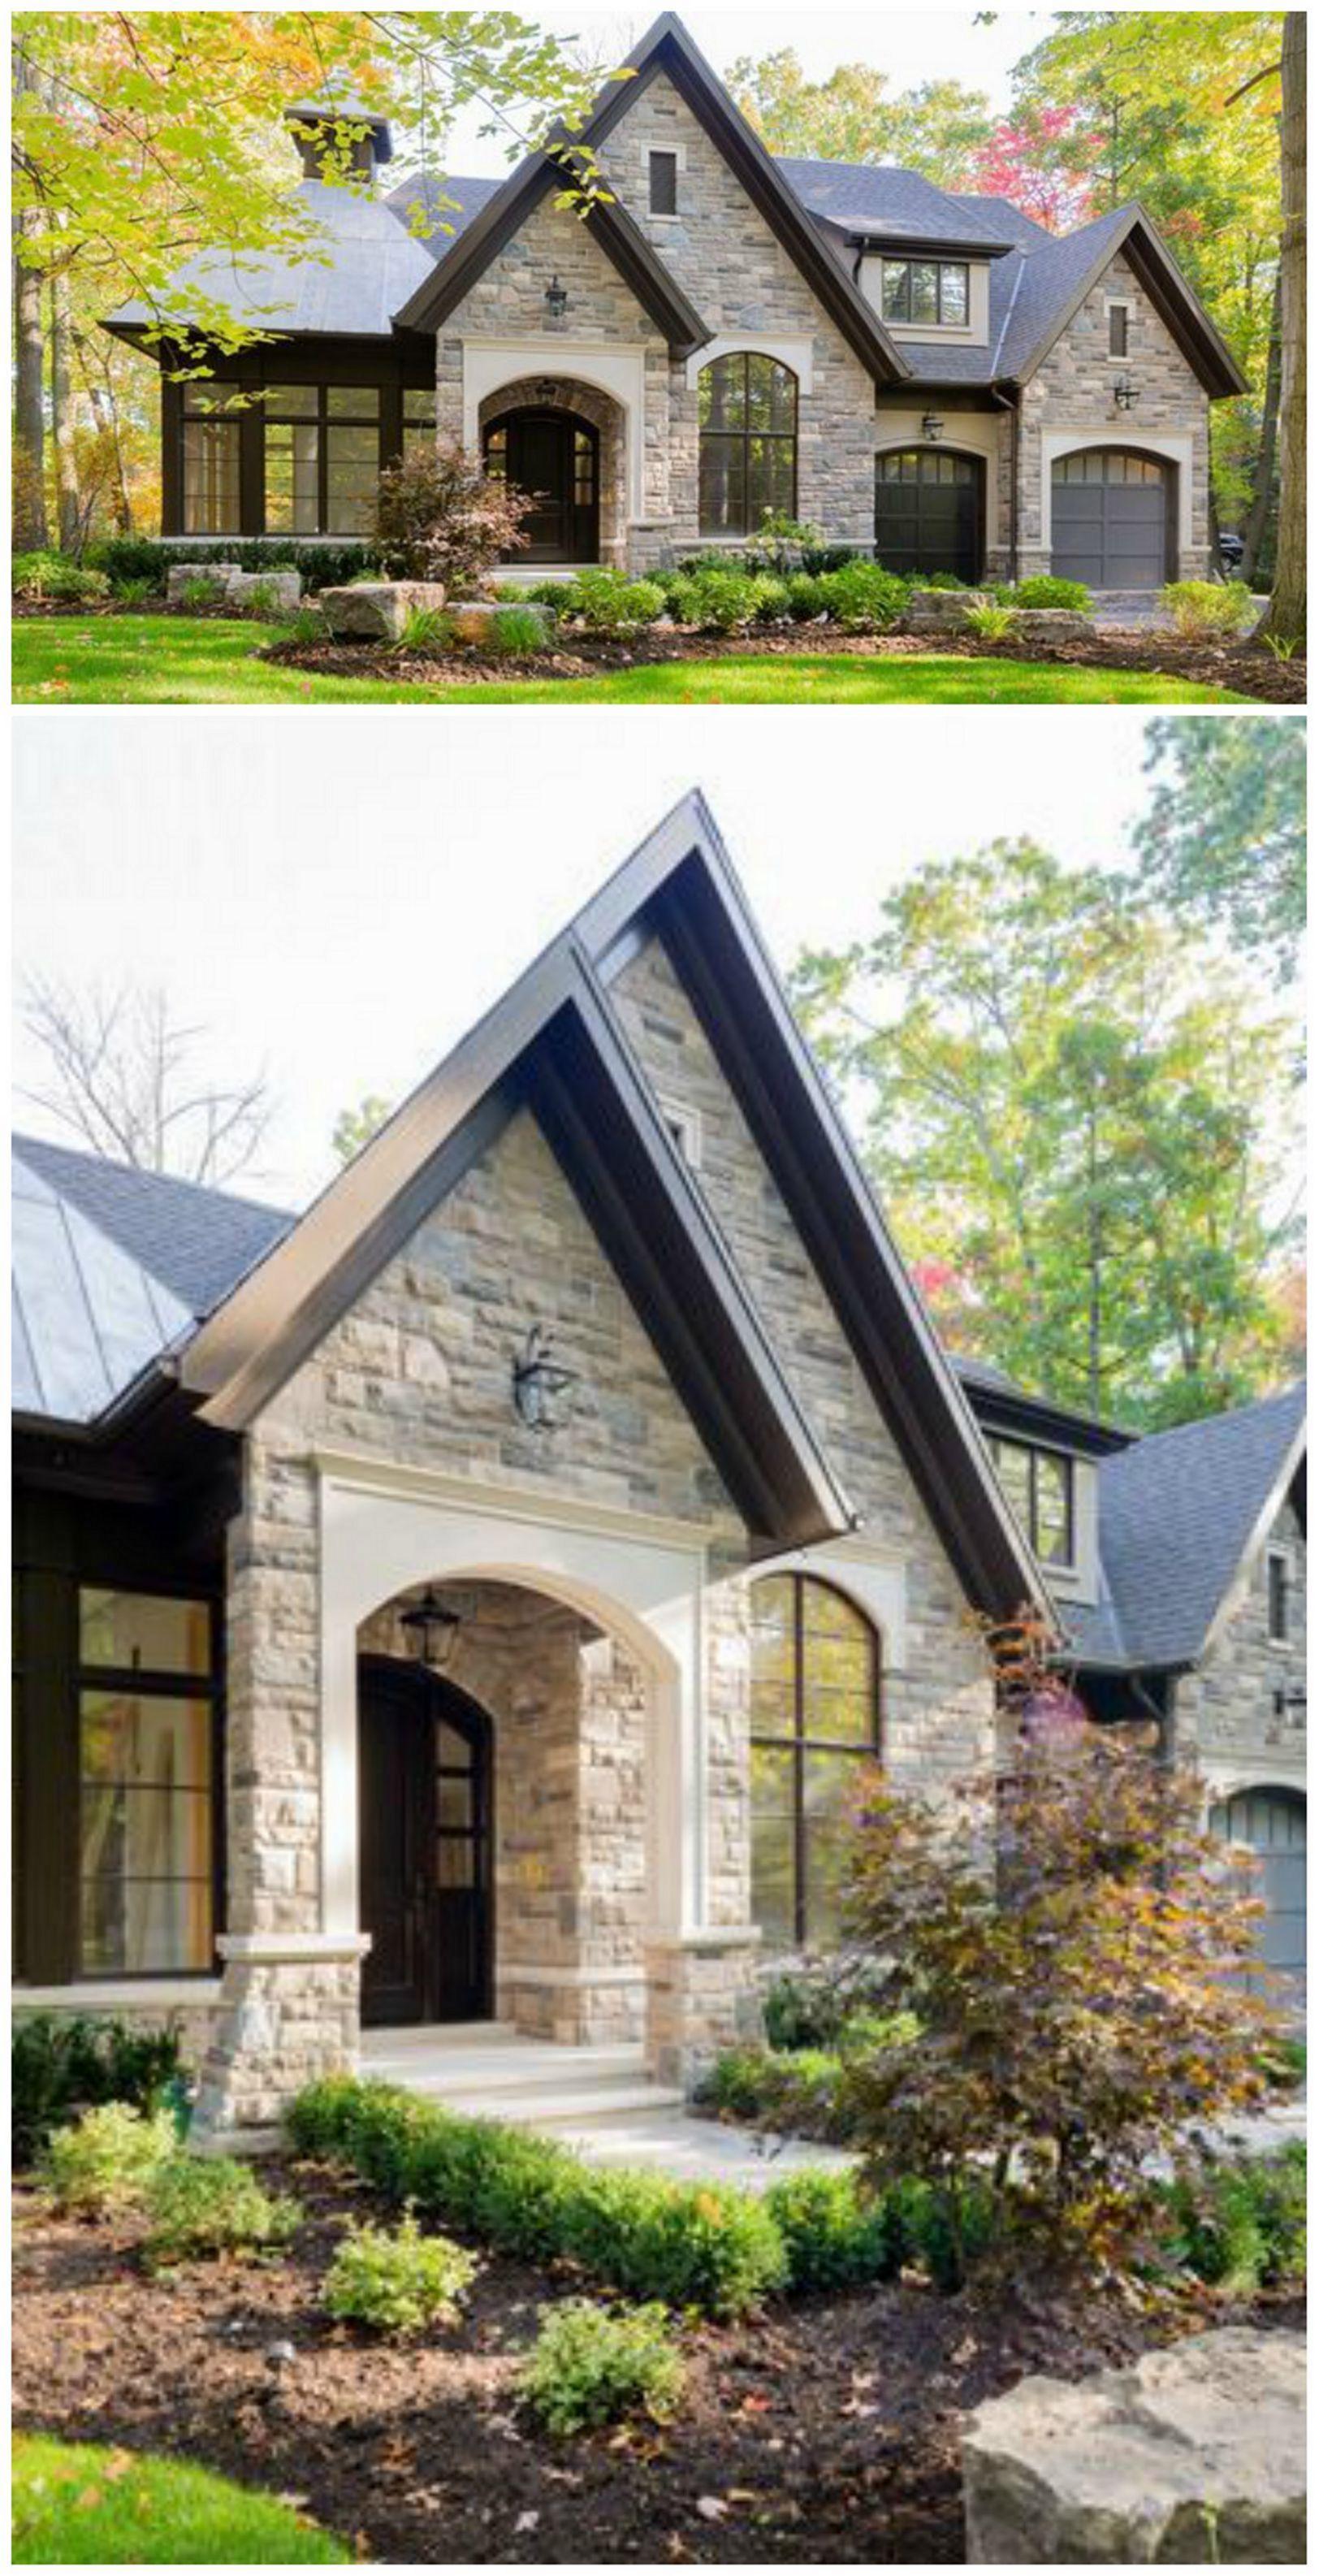 25 Beautiful Stone House Design Ideas On A Budget Small House Exteriors House Exterior Exterior Design